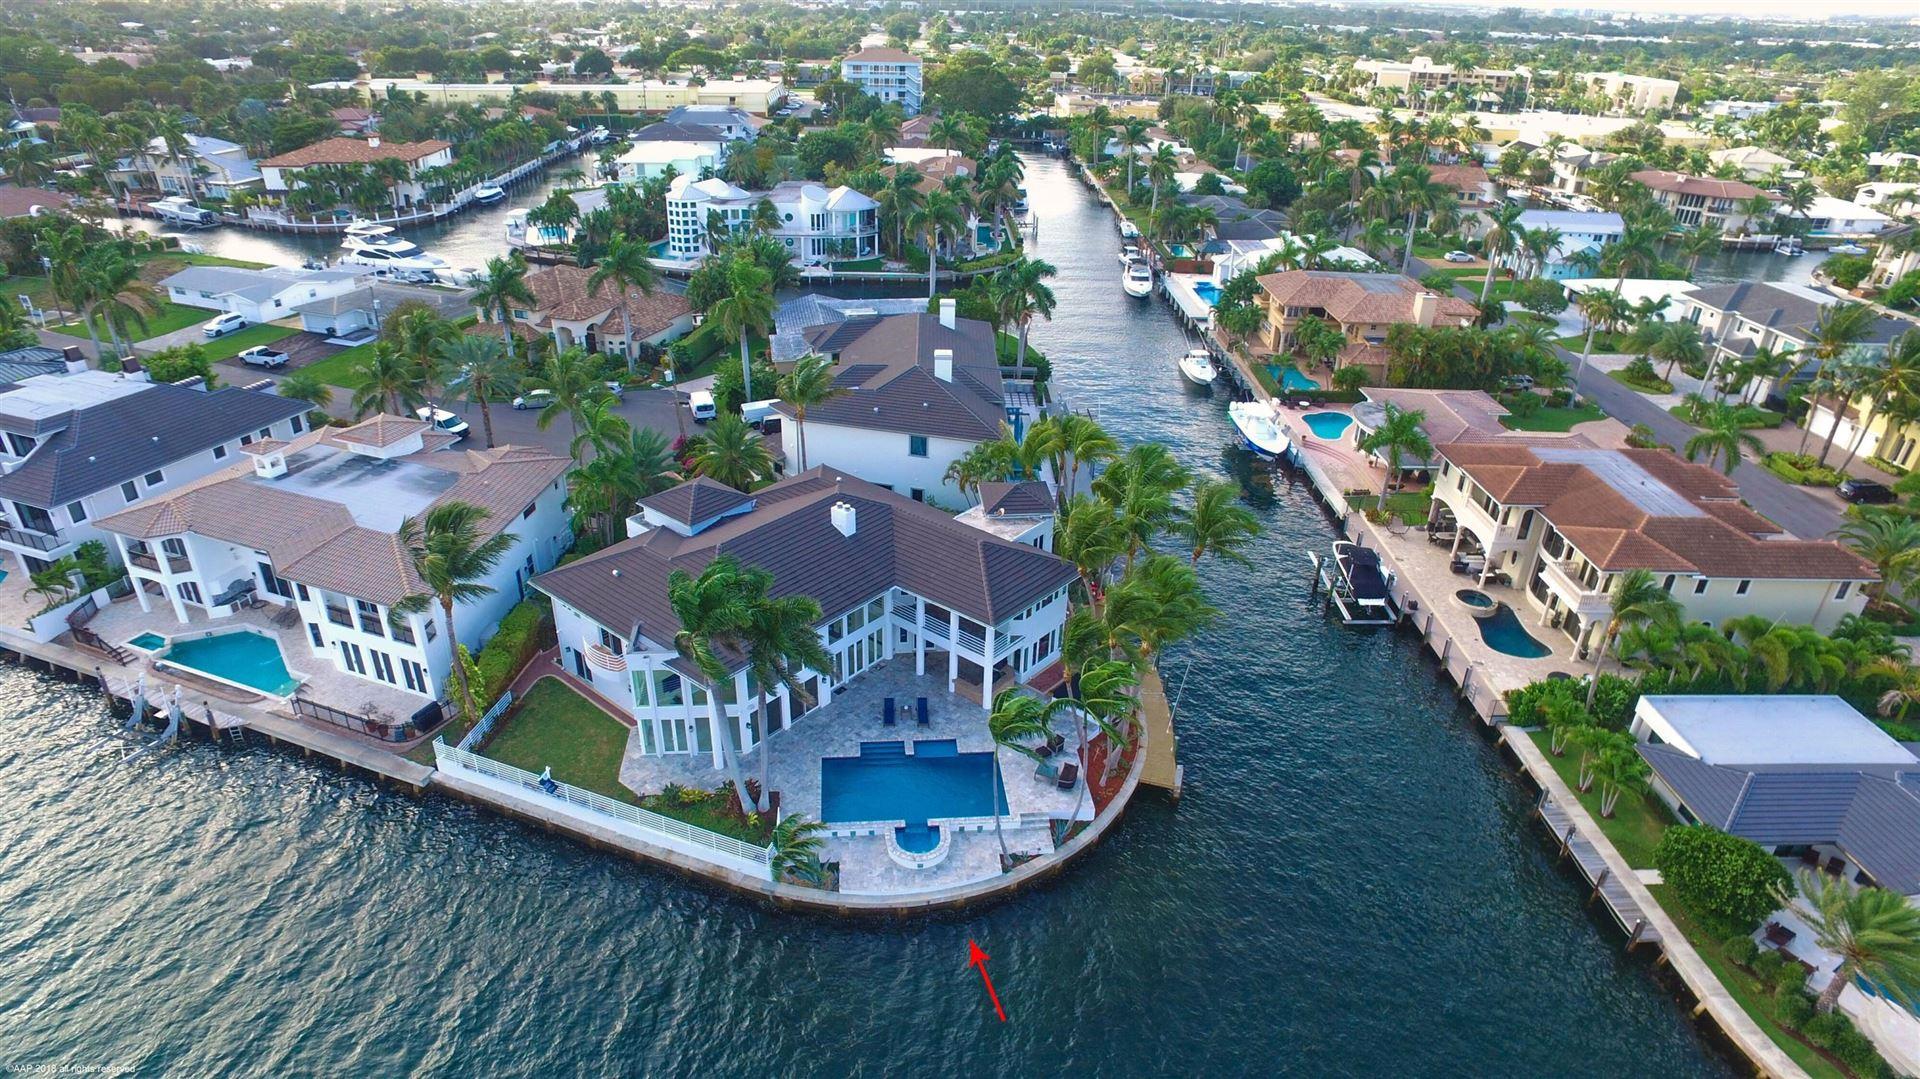 800 NE Harbour Drive, Boca Raton, FL 33431 - #: RX-10487236